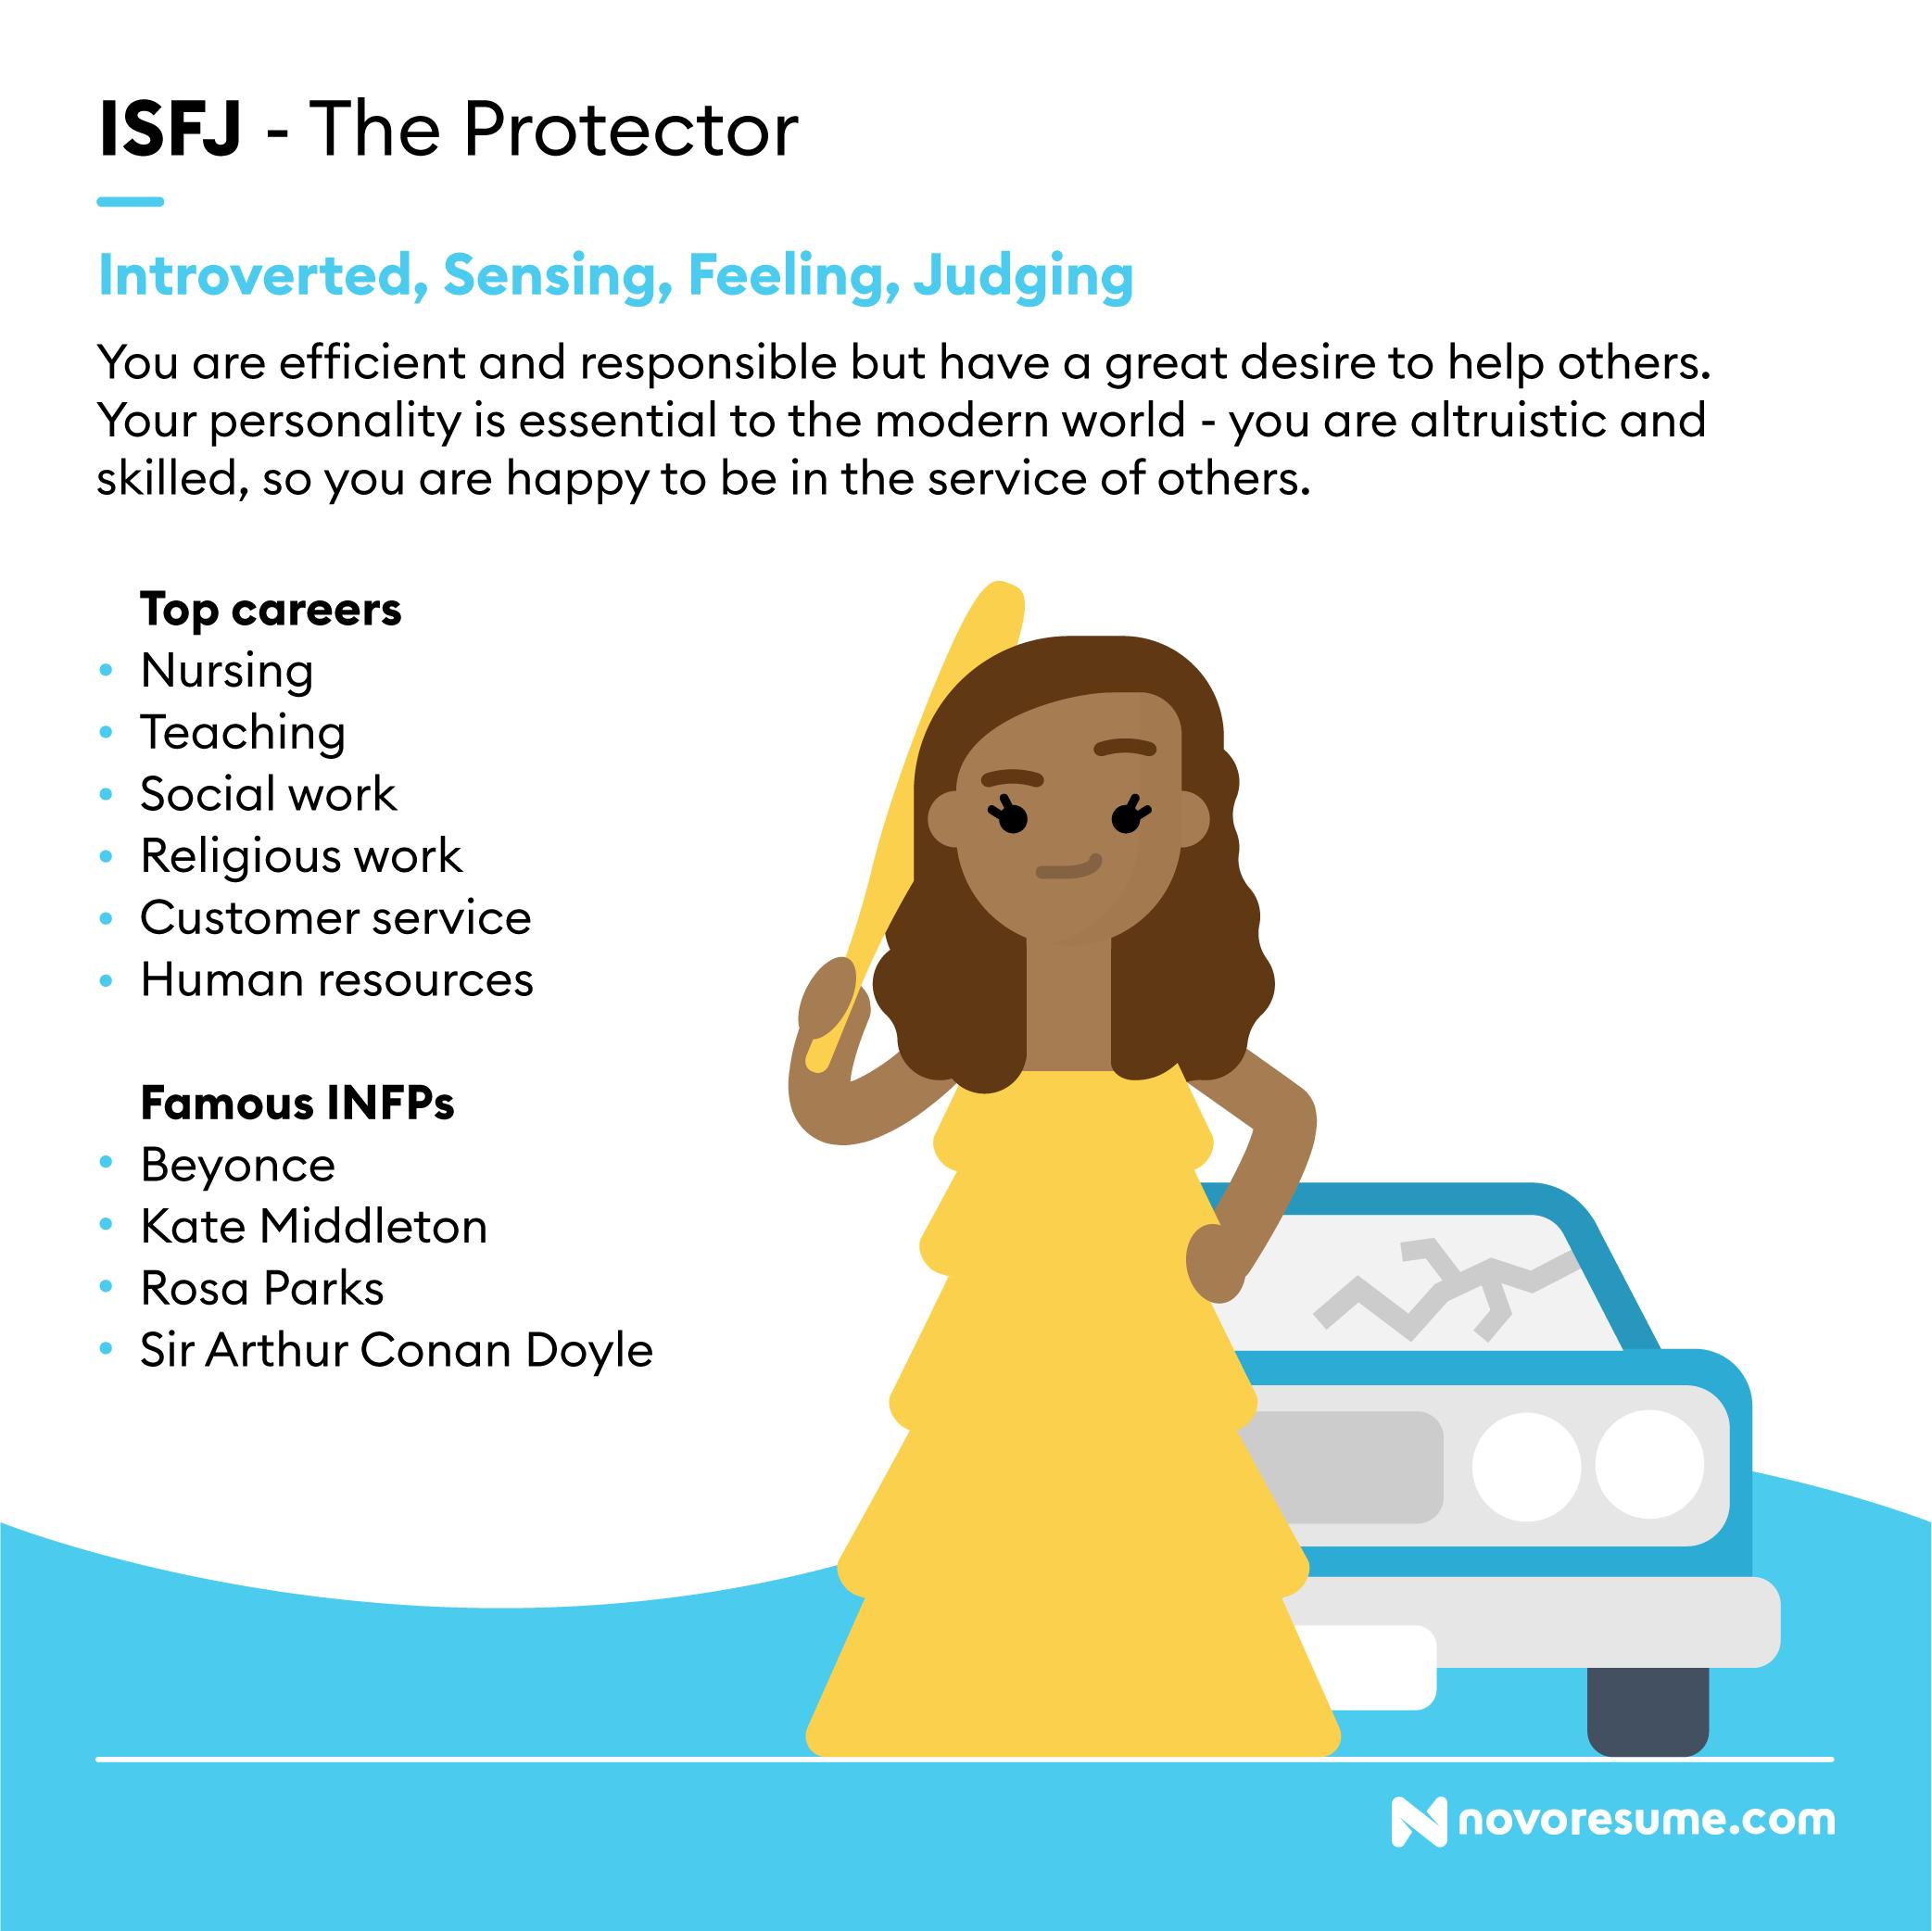 ISFJ The Protector